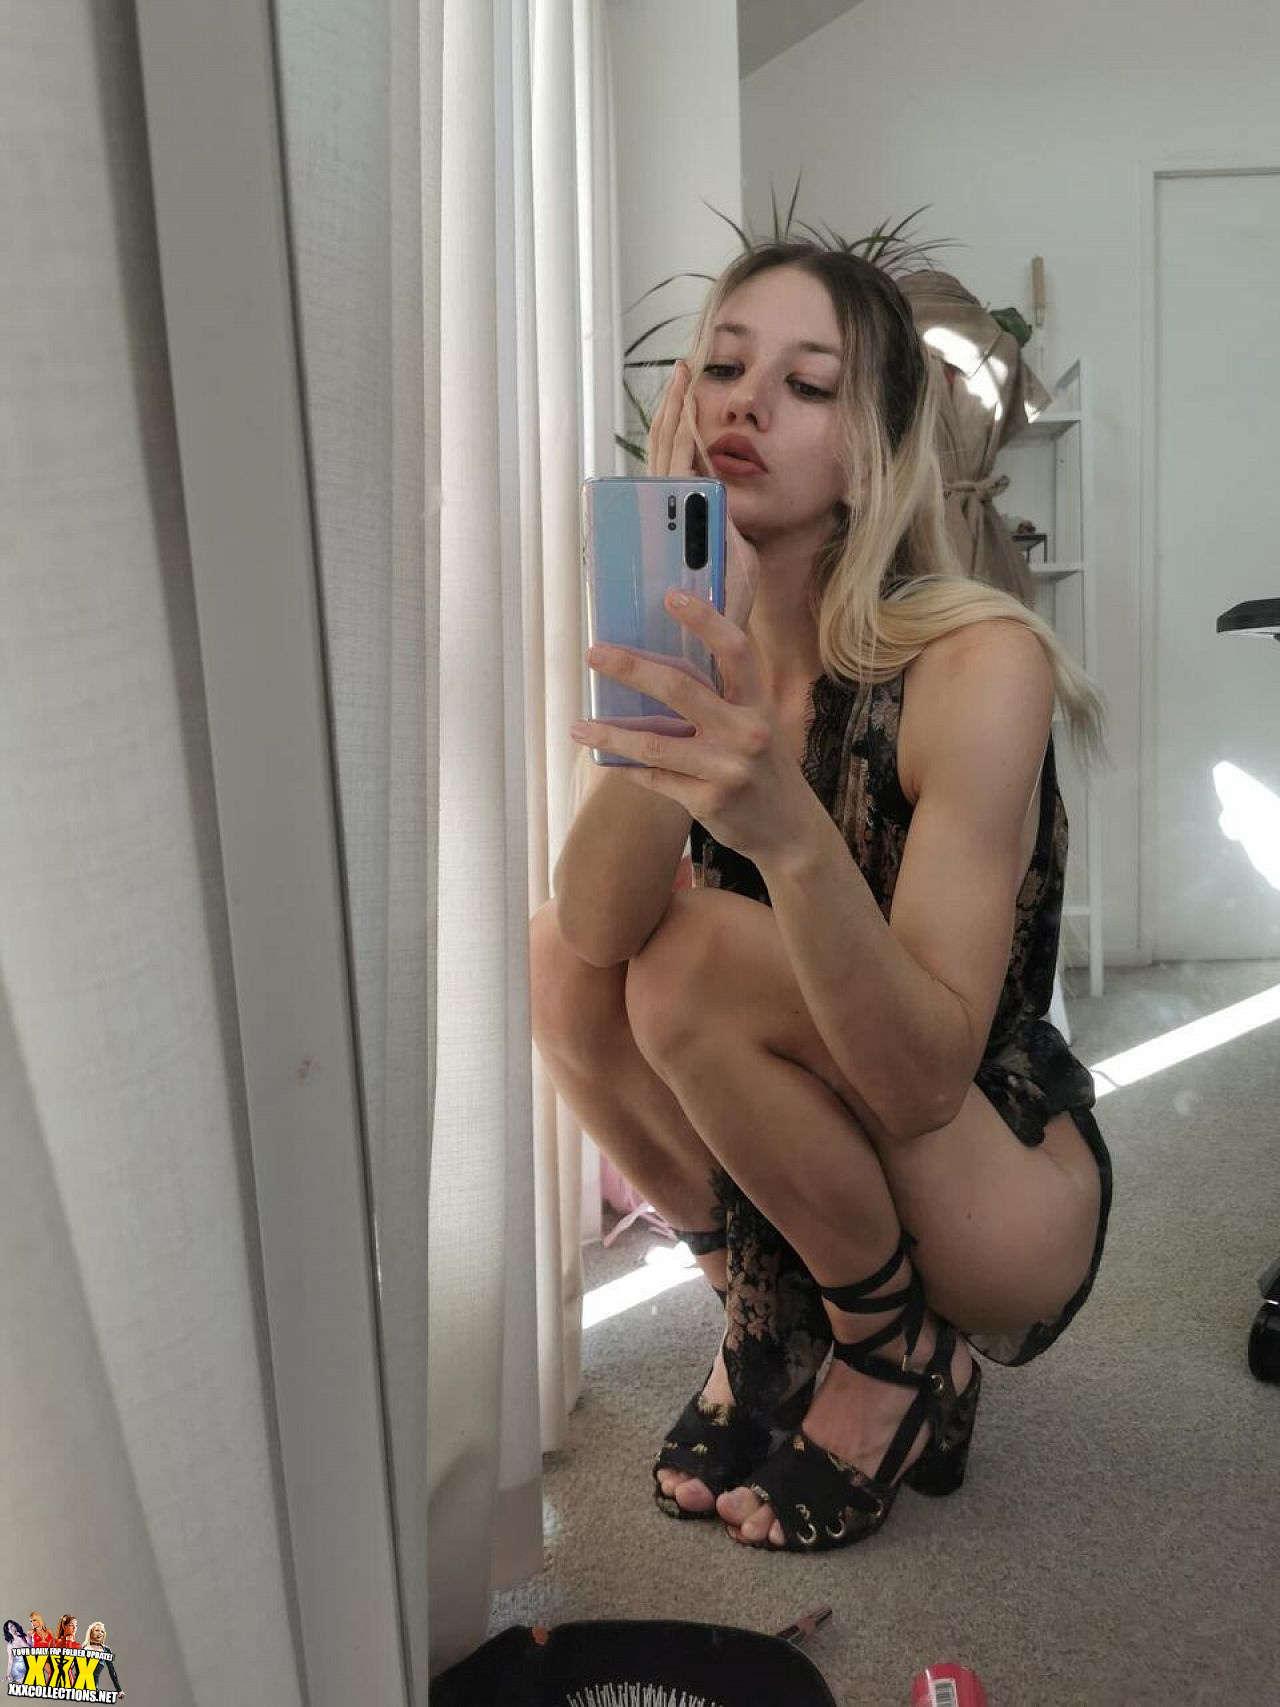 https://fitnakedgirls.com/wp-content/uploads/2020/06/FitNakedGirls.com-Alicenz-nude-38.jpg